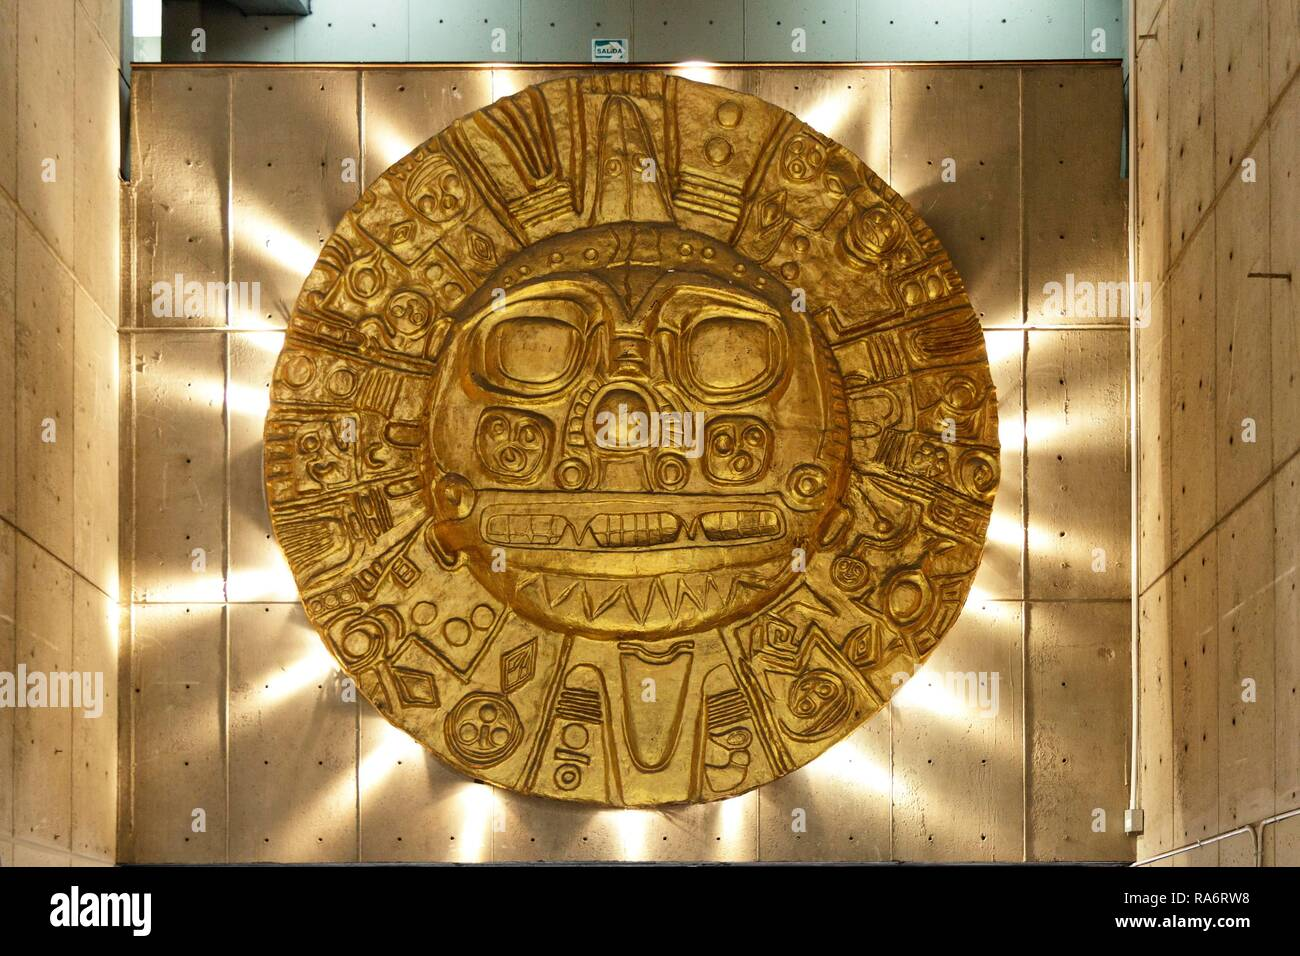 Golden Inca artefact in the National Museum, Lima, Peru - Stock Image